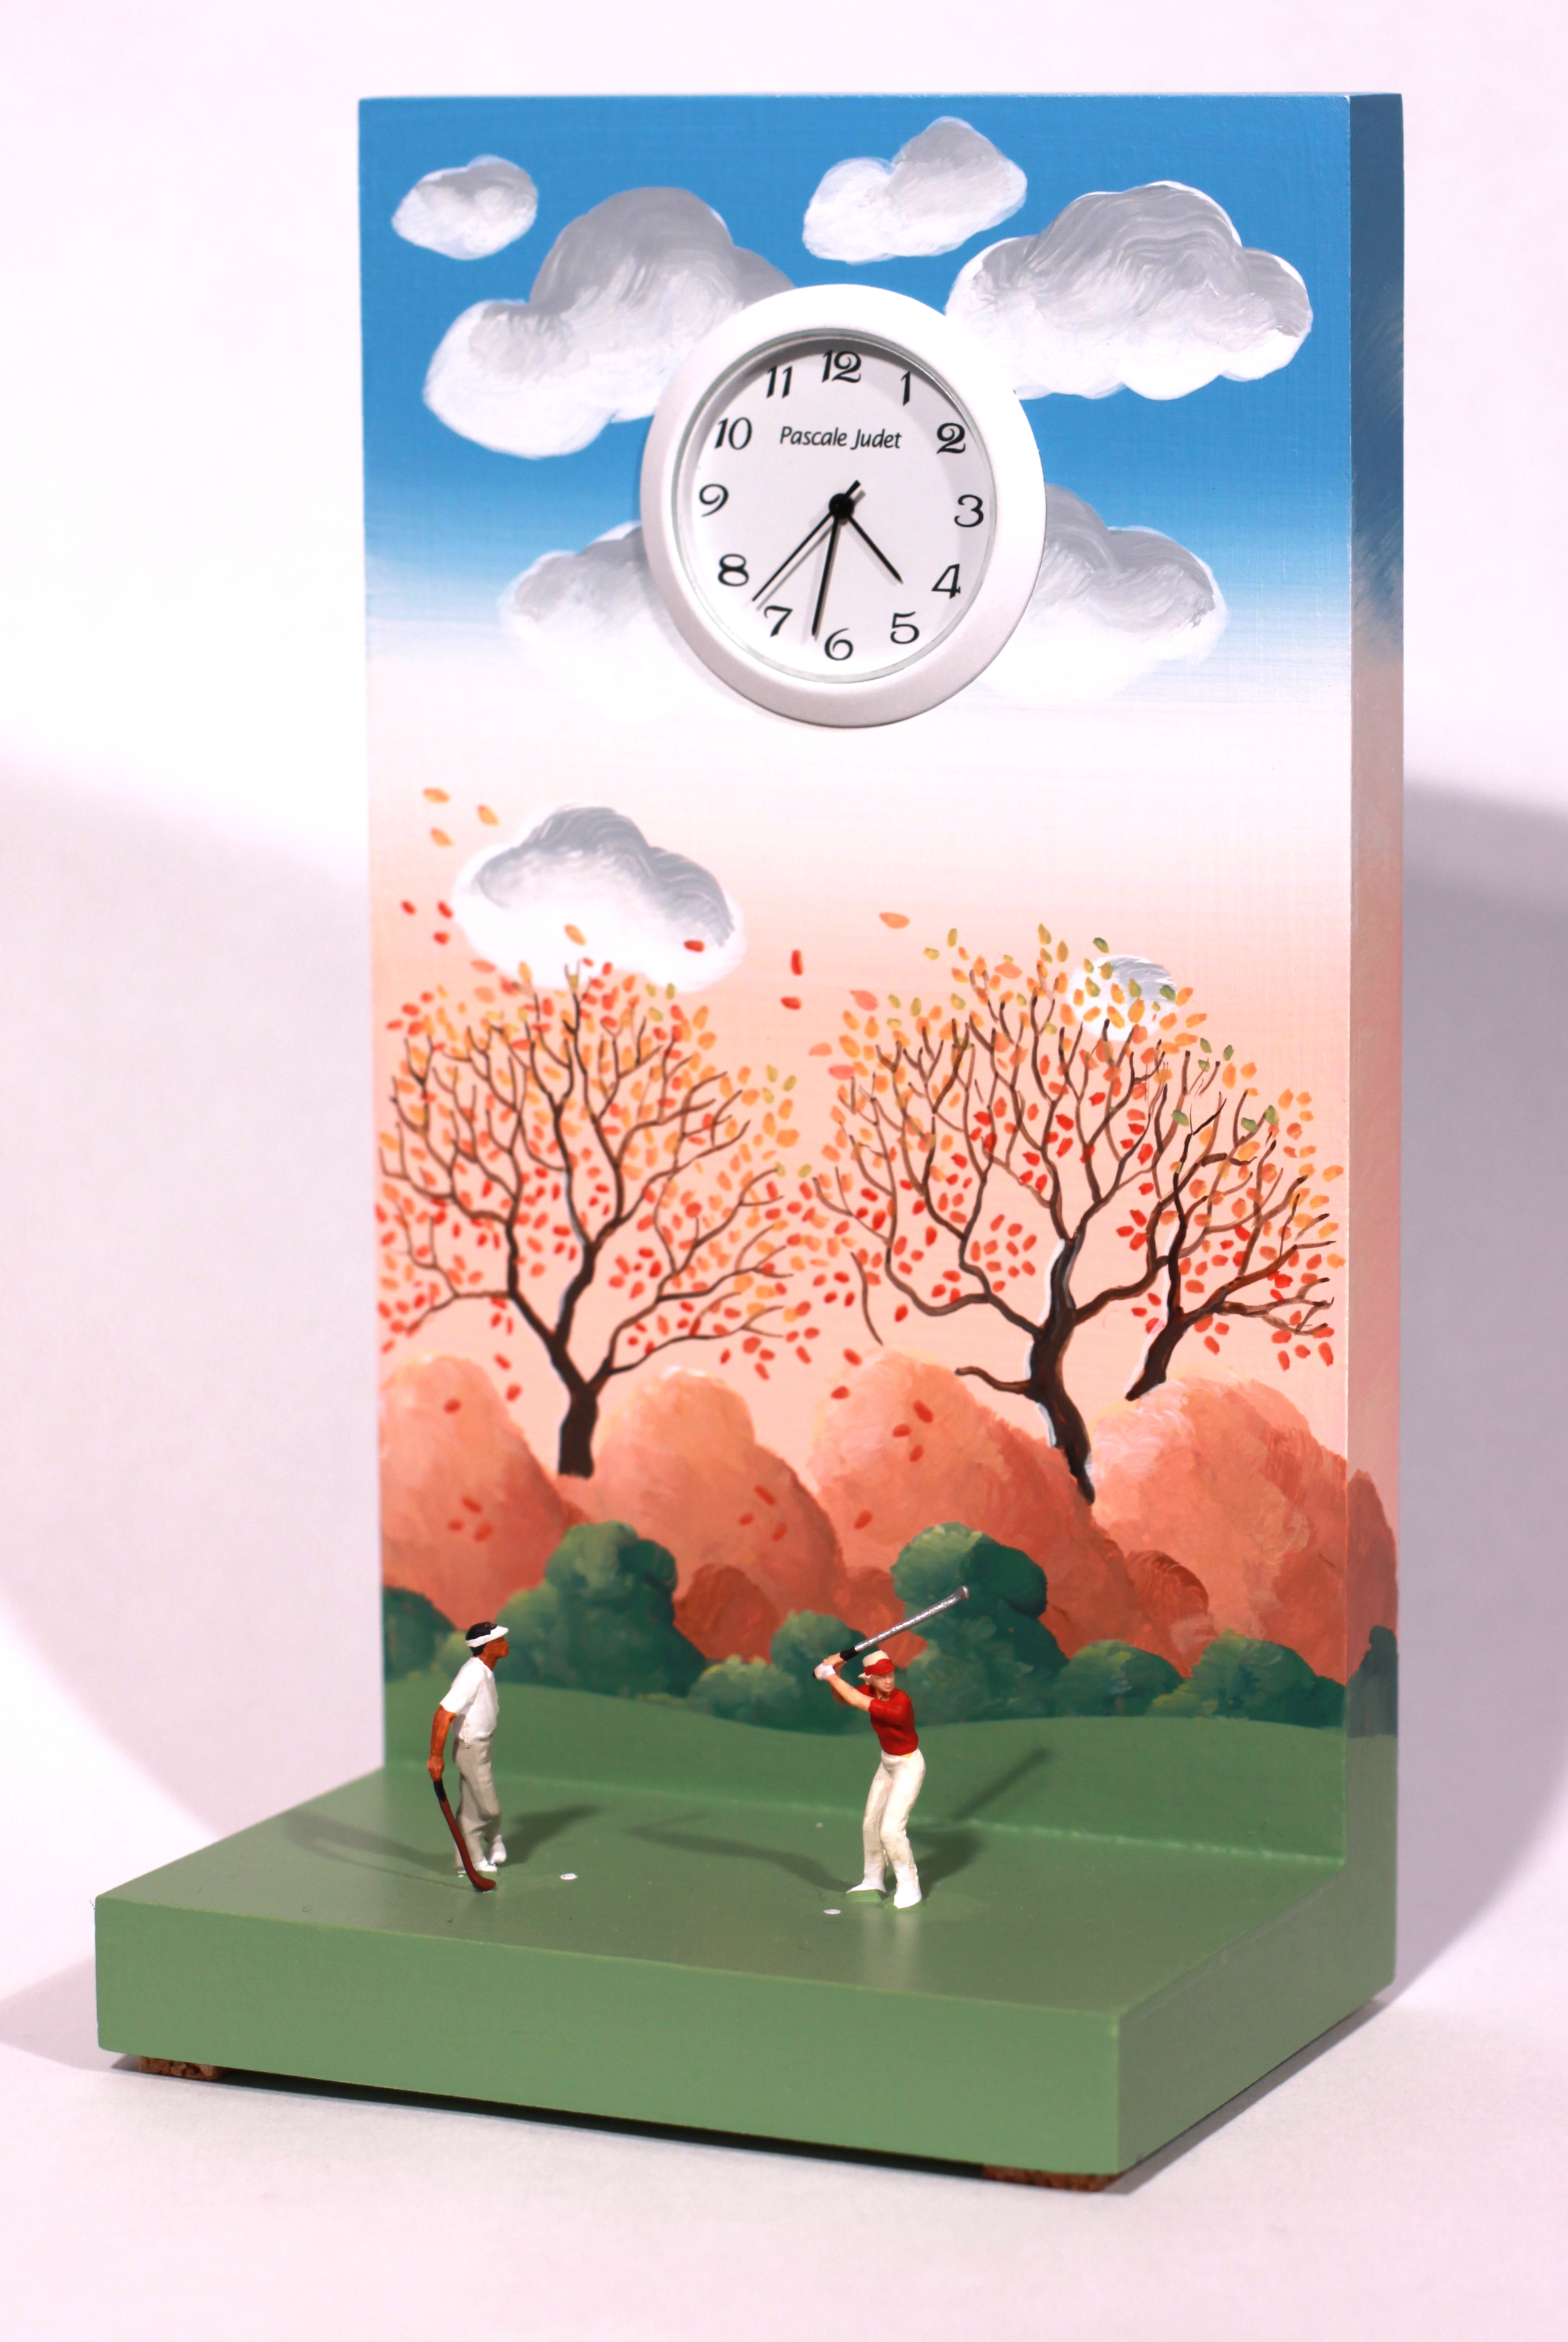 200 - Autumnal golfers